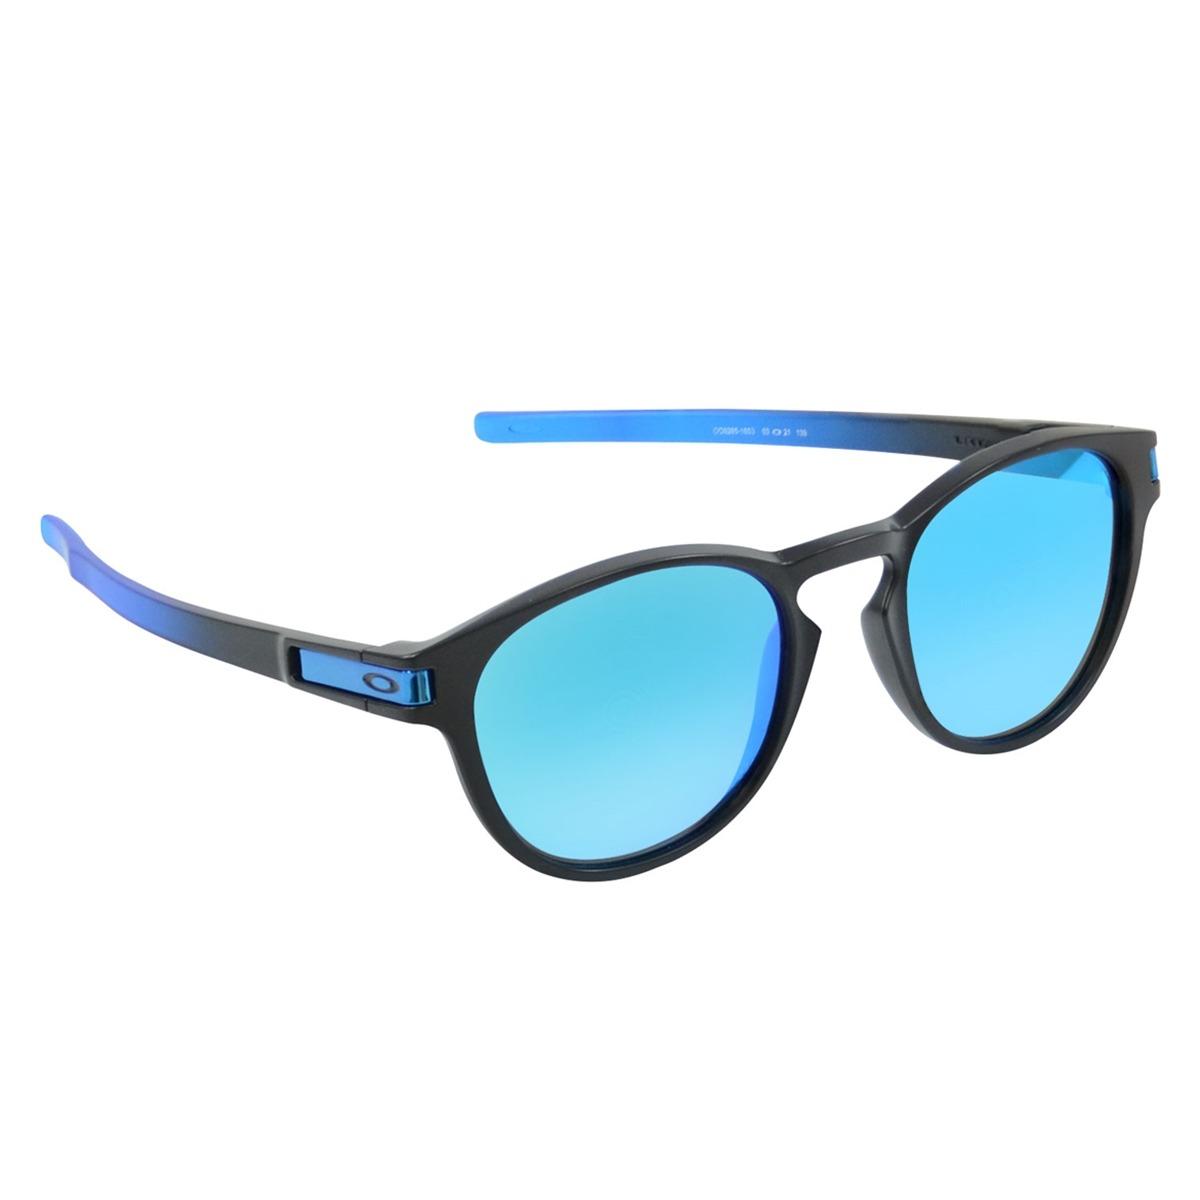 520cc115fb óculos oakley latch prizm espelhado preto l azul. Carregando zoom.